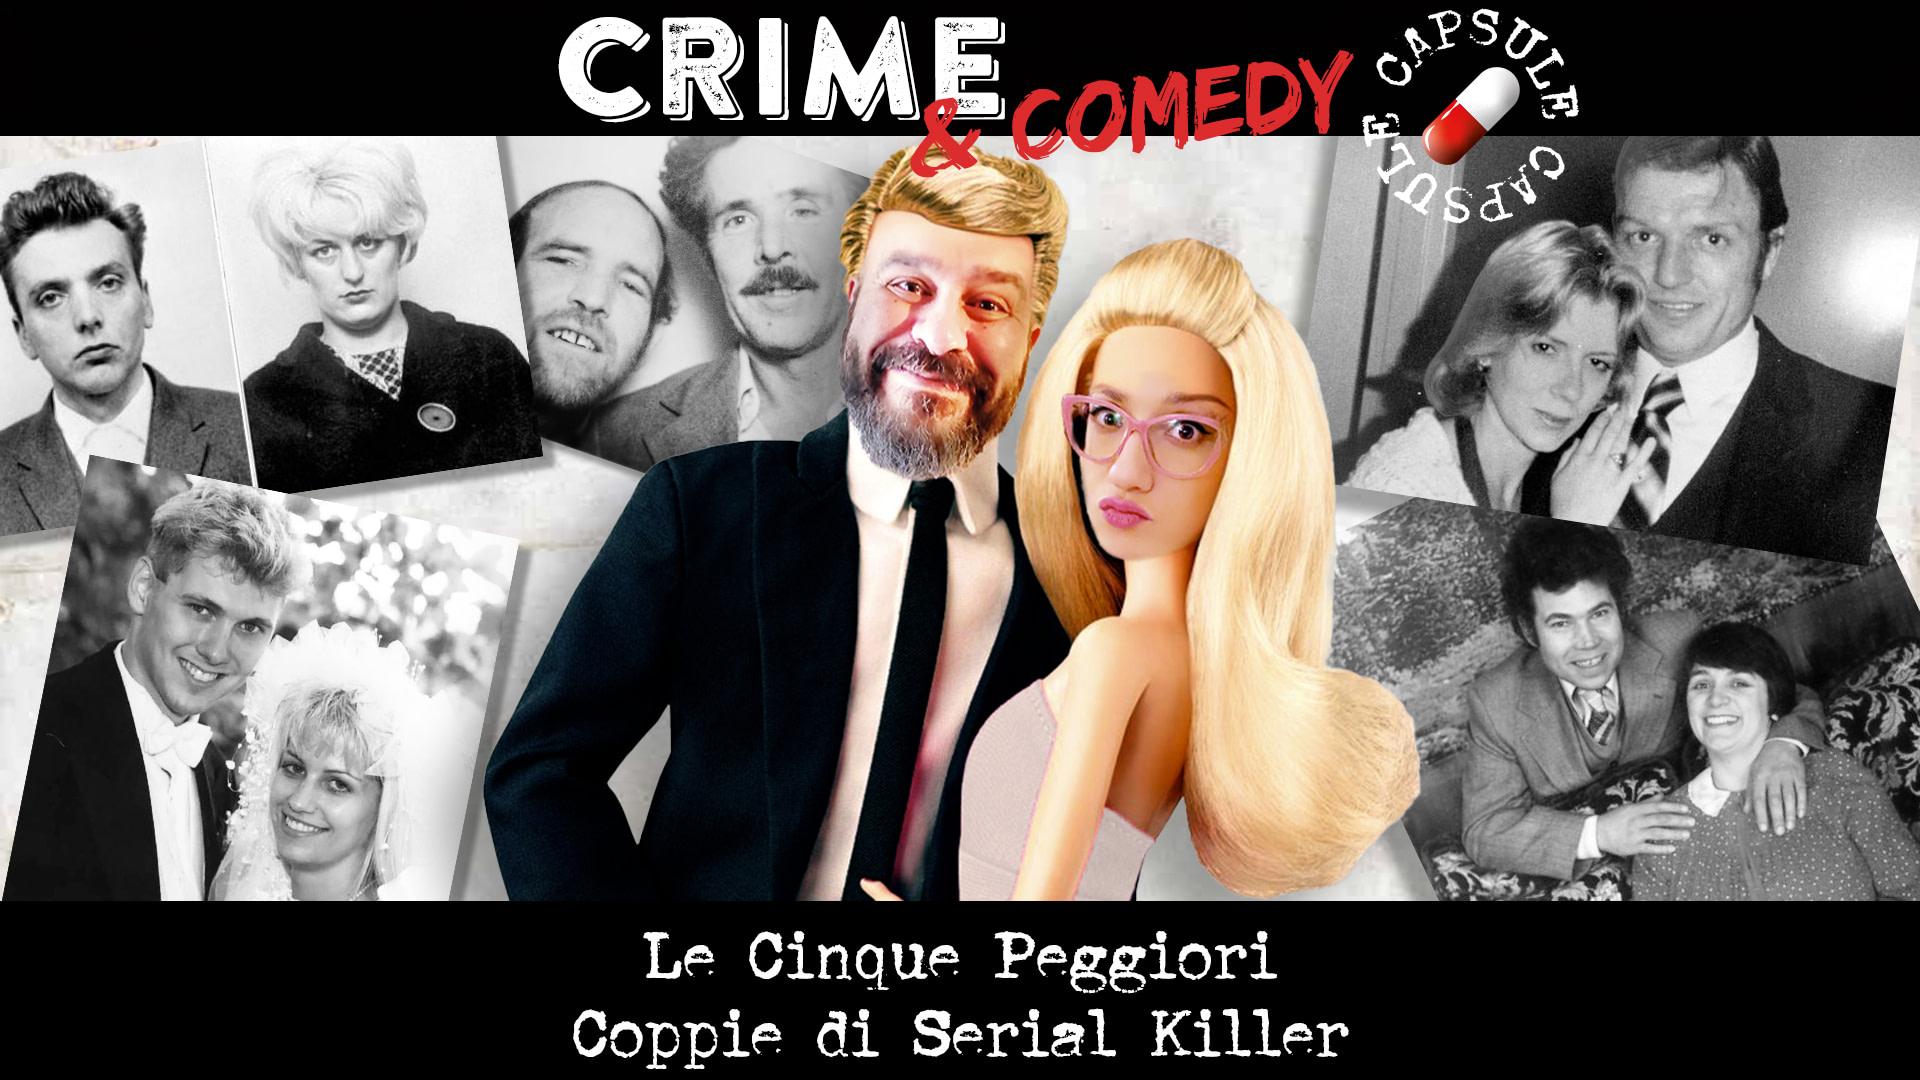 Le 5 Peggiori Coppie di Serial Killer - C&C Capsule